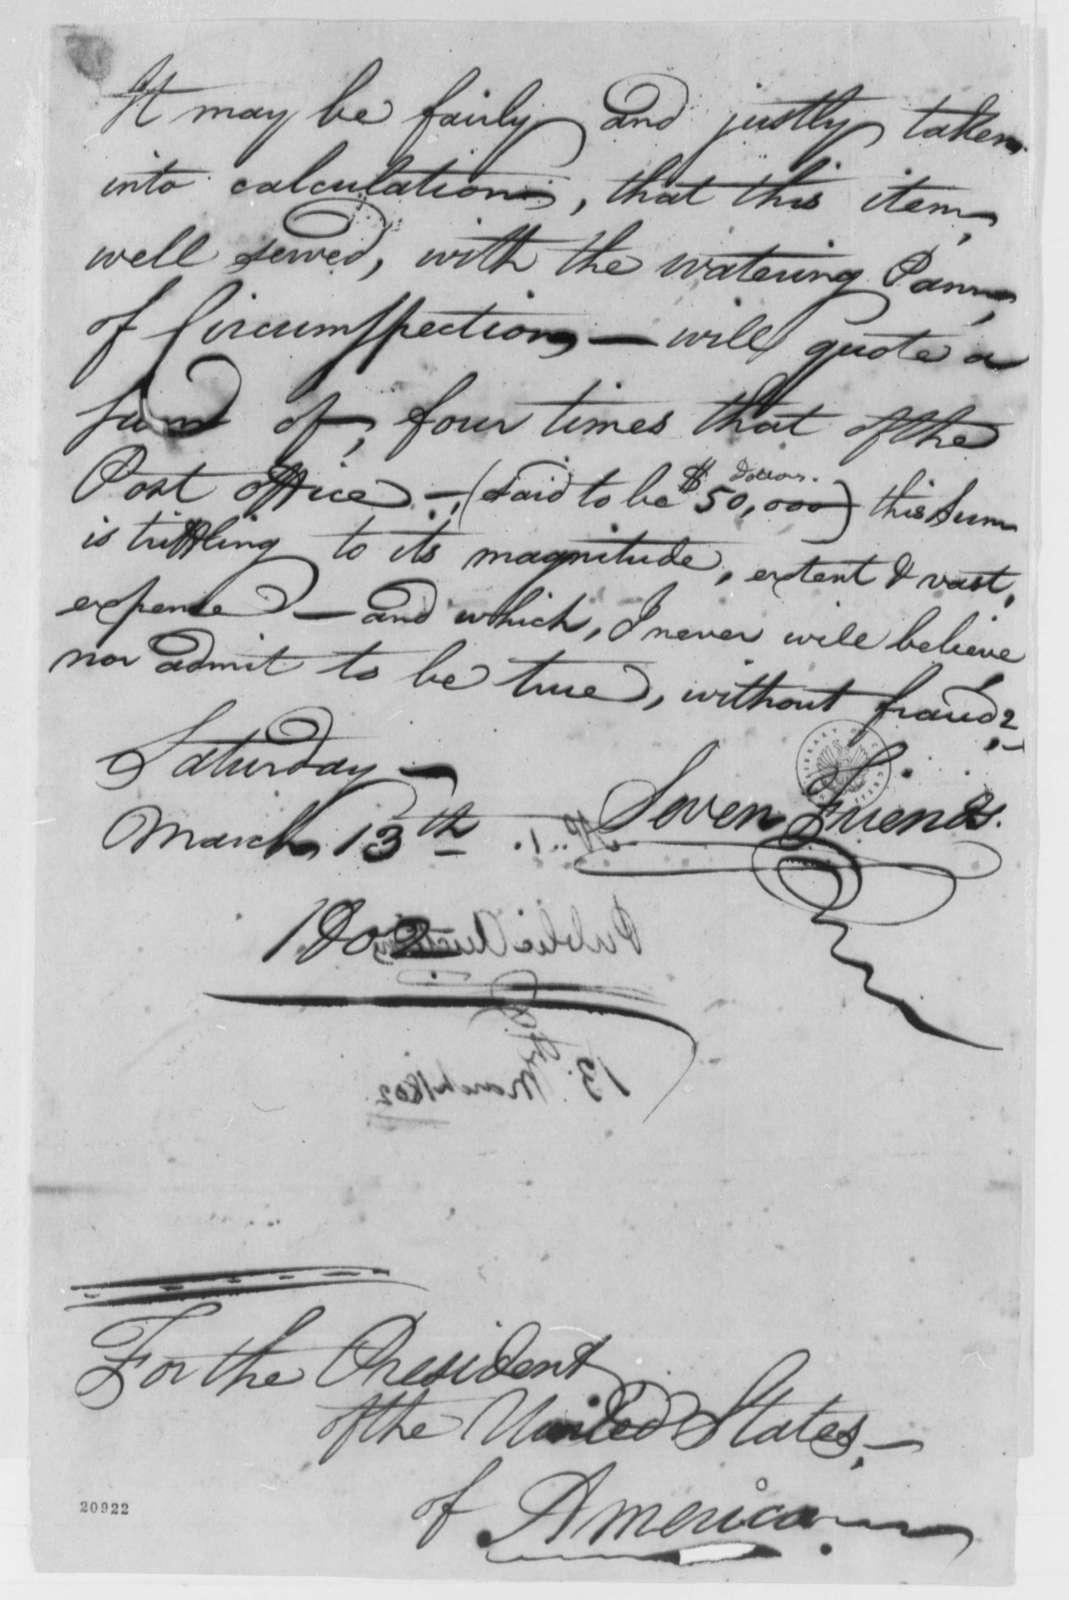 David Fergusson to Thomas Jefferson, March 13, 1802, Statement of Public Auction